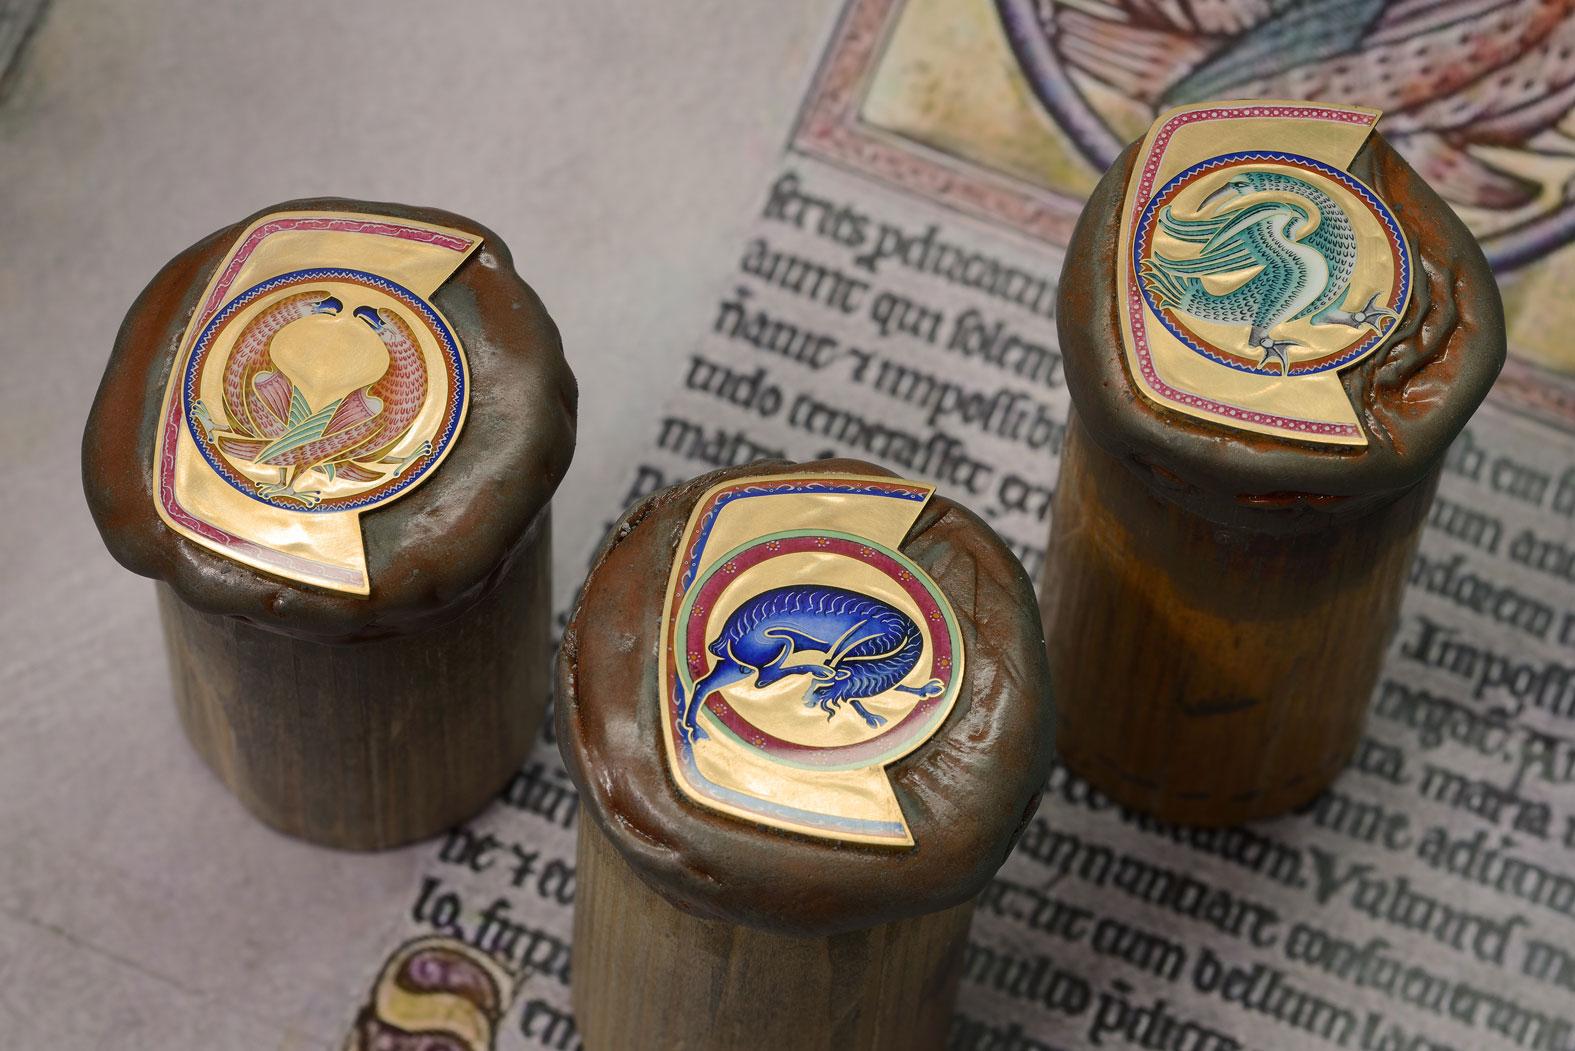 Vacheron Constantin Métiers d'Art Savoirs Enluminés esferas termindas